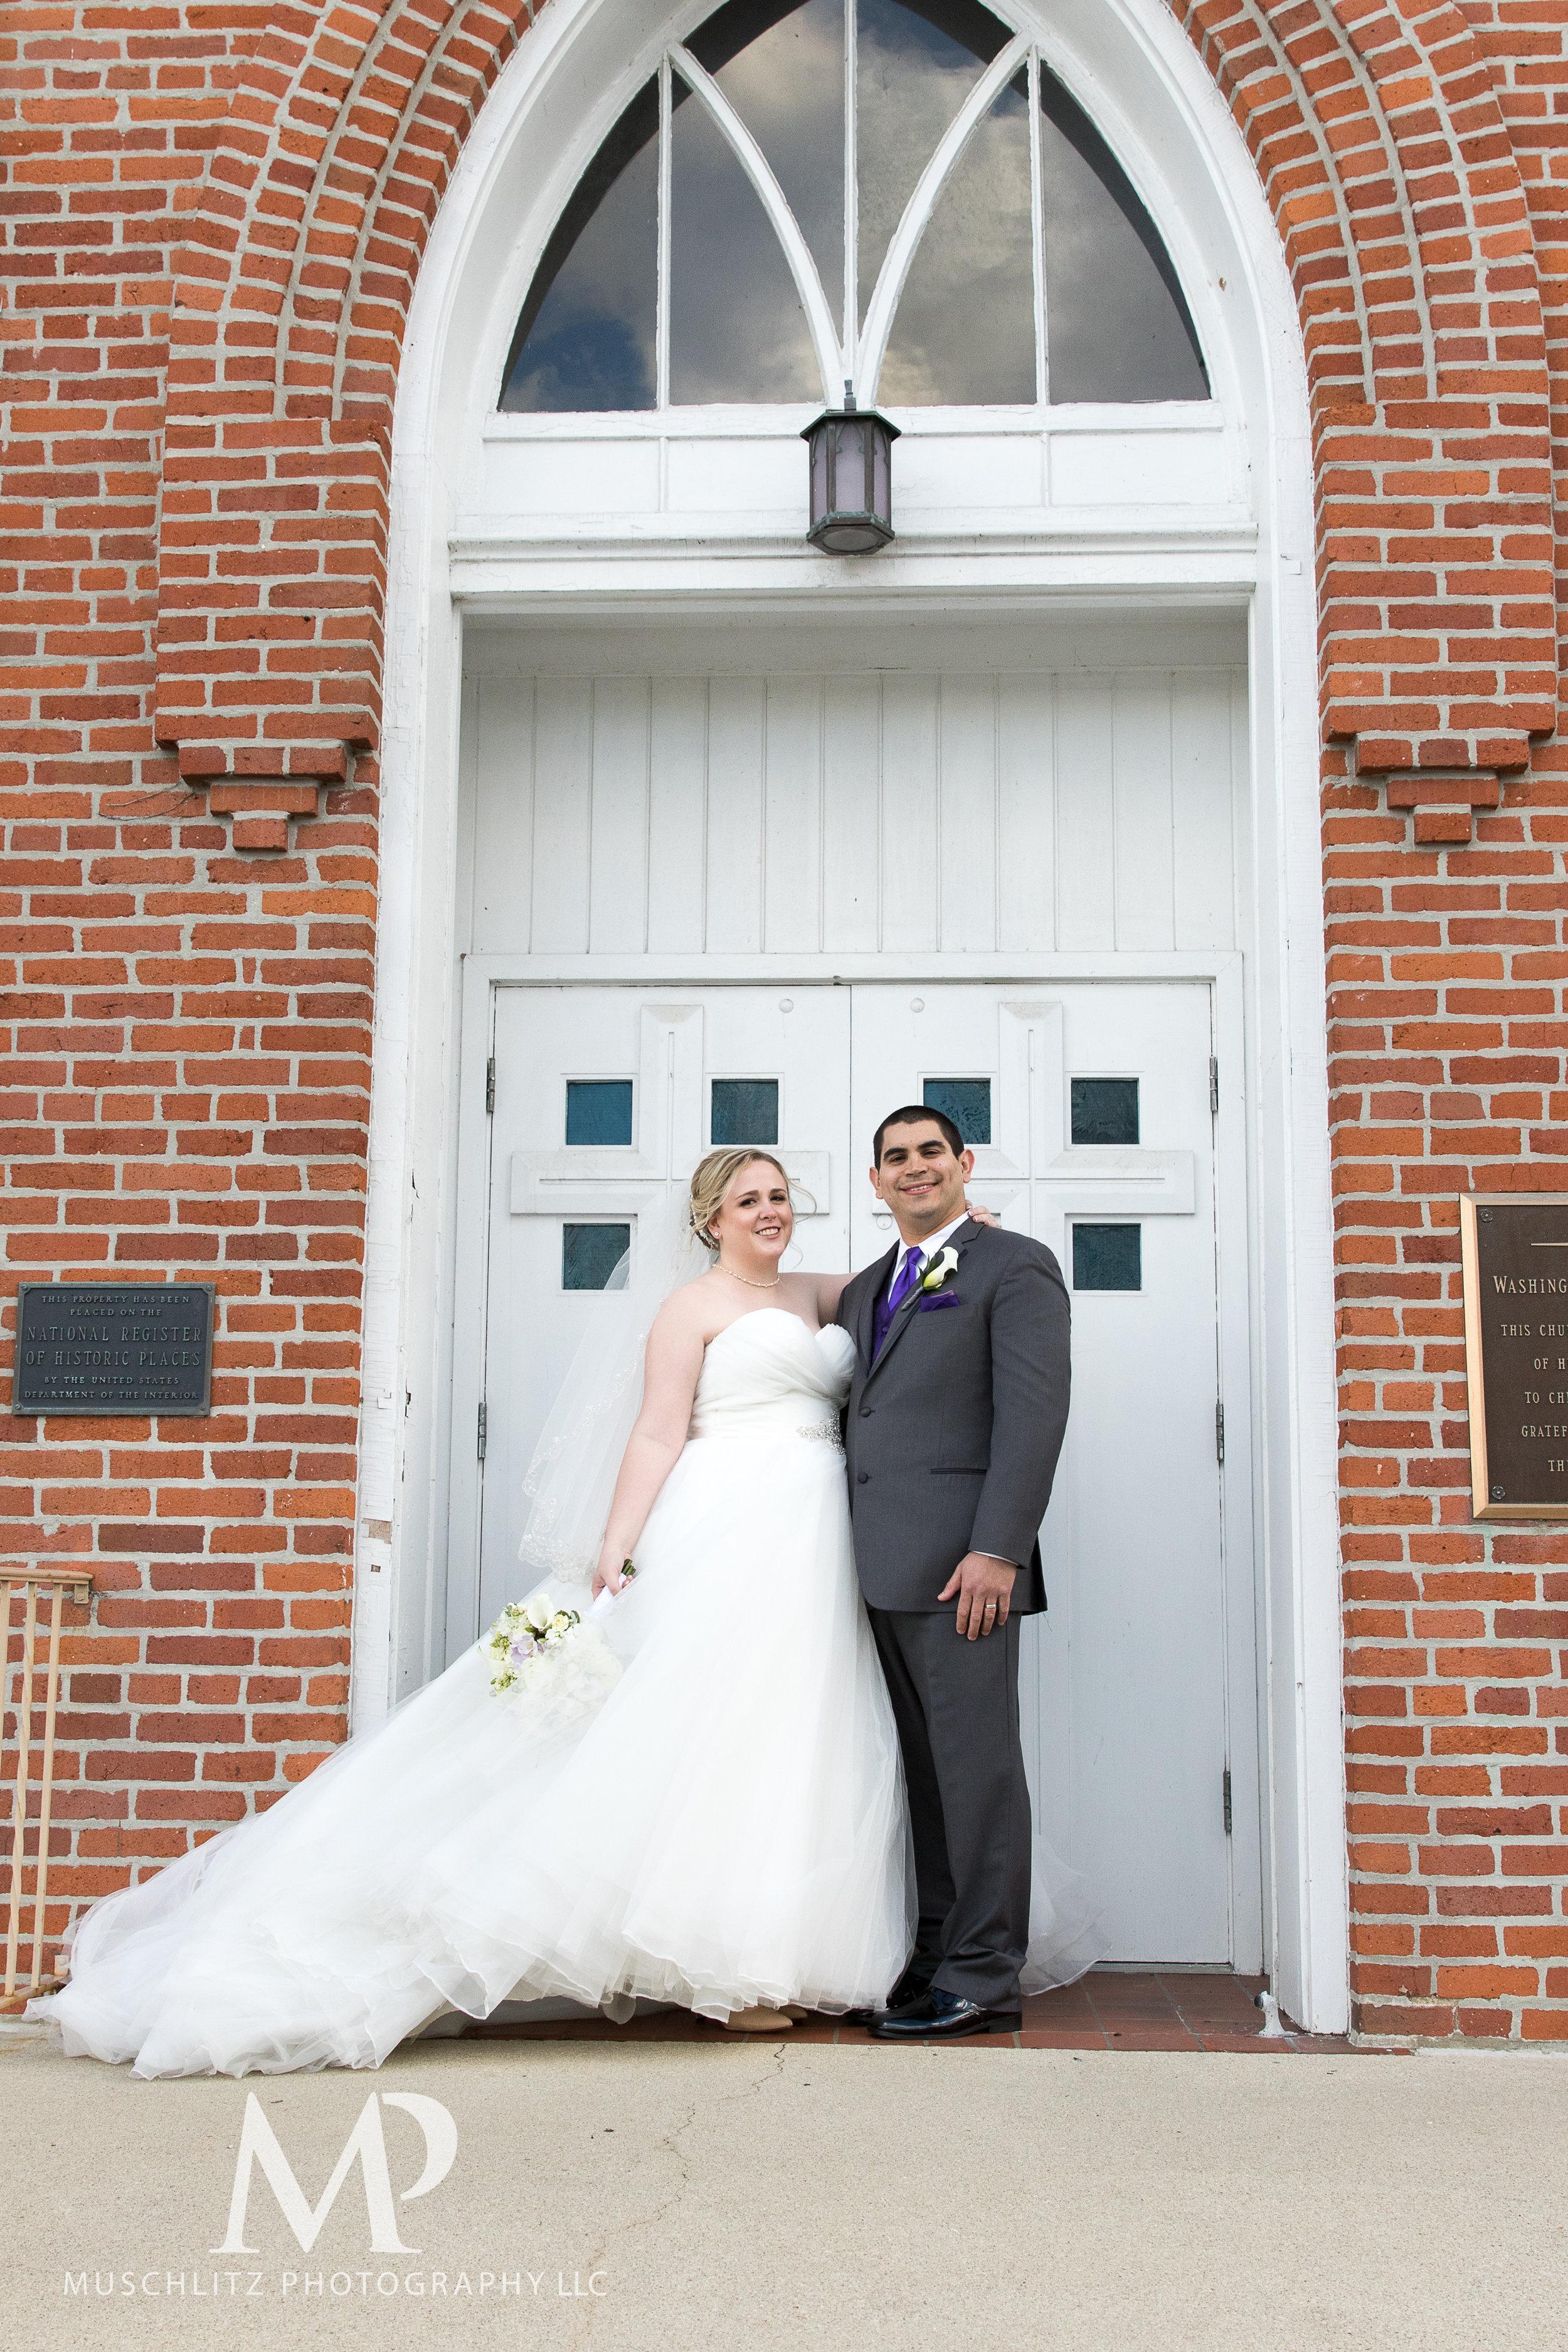 dublin-community-church-wedding-columbus-ohio-muschlitz-photography-087.JPG